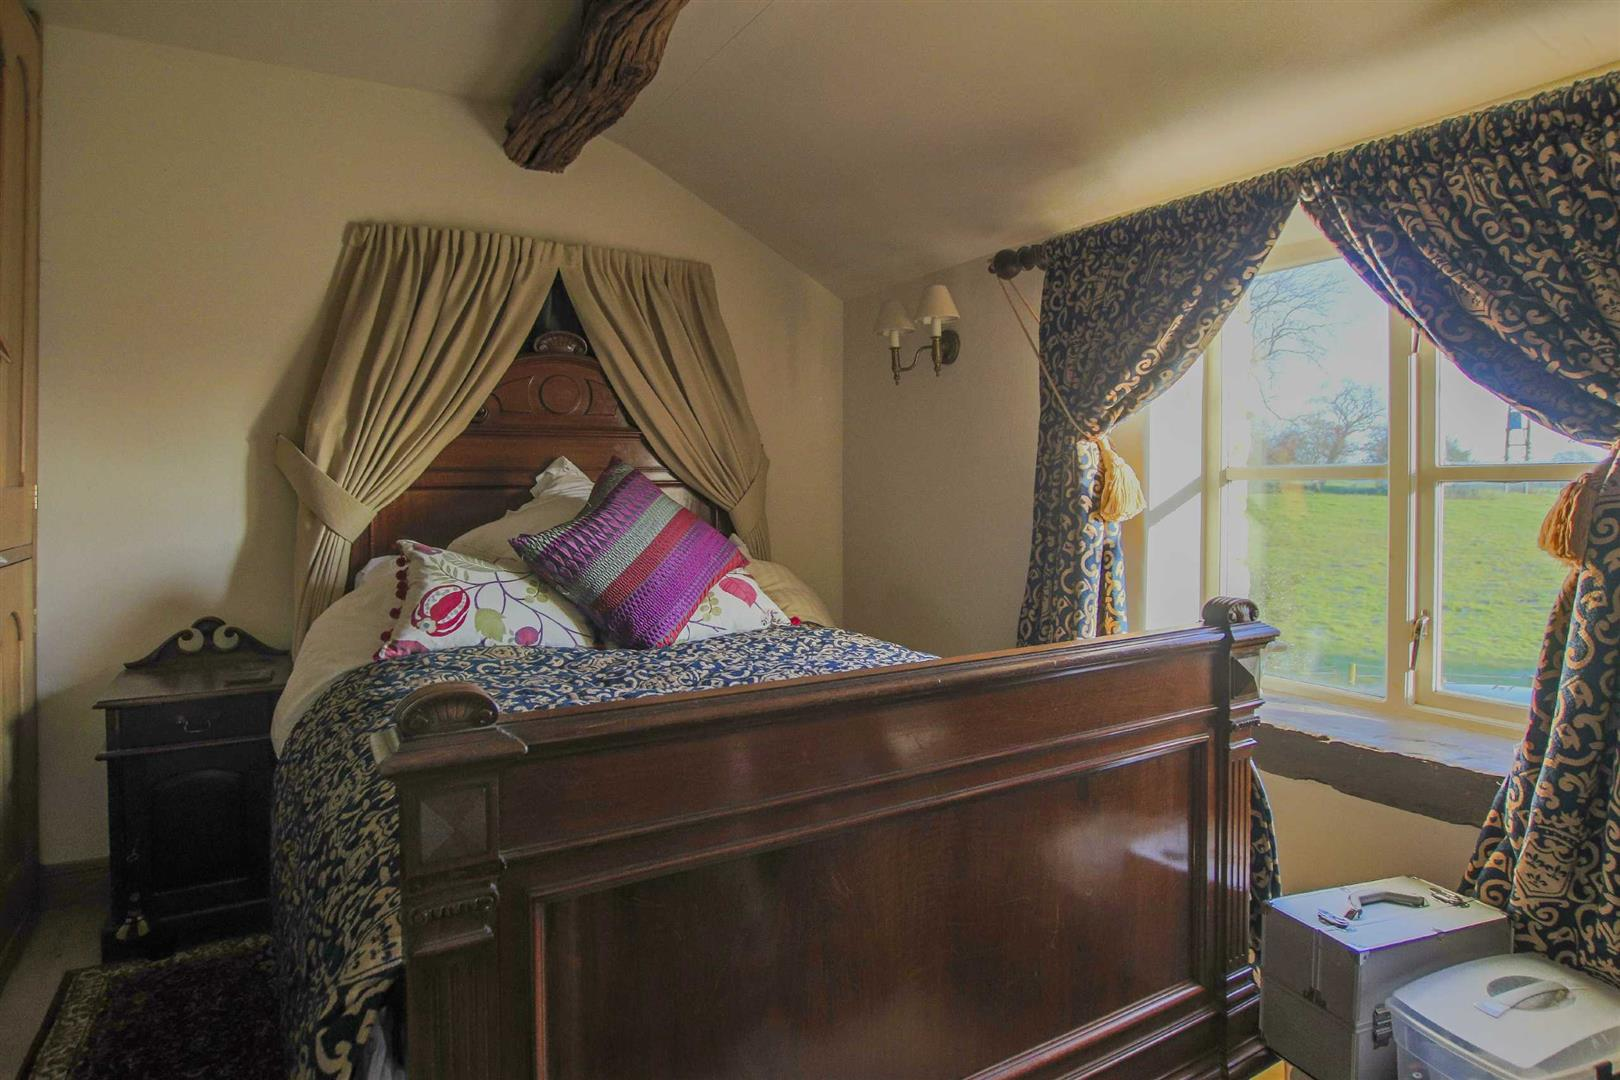 3 Bedroom Semi-detached House For Sale - p038856_23.jpg